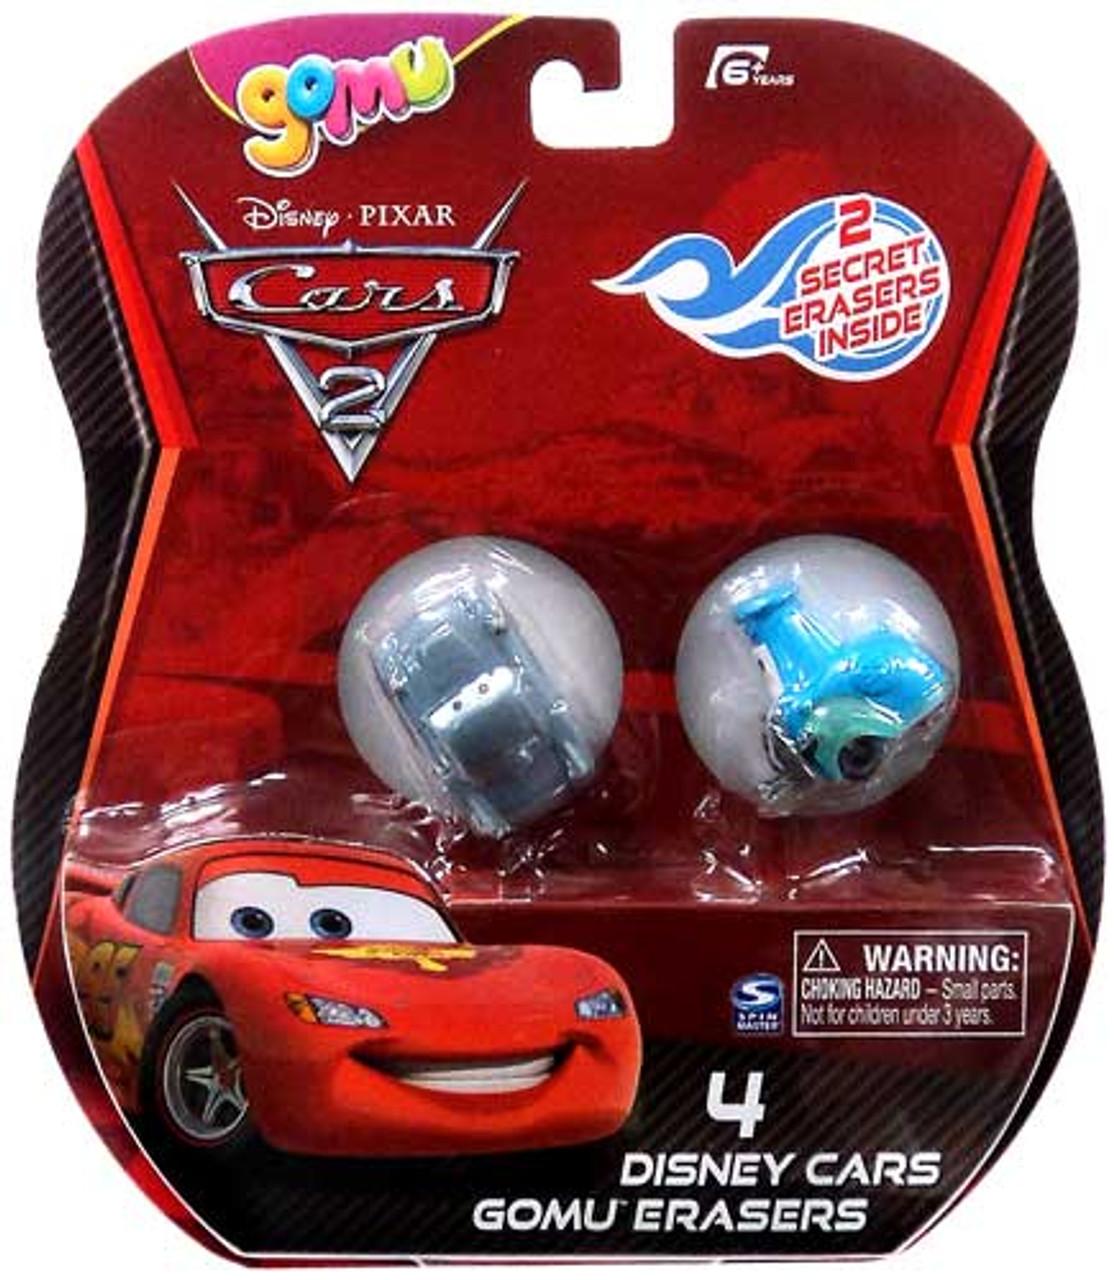 disney pixar cars cars 2 gomu finn mcmissile guido gomu